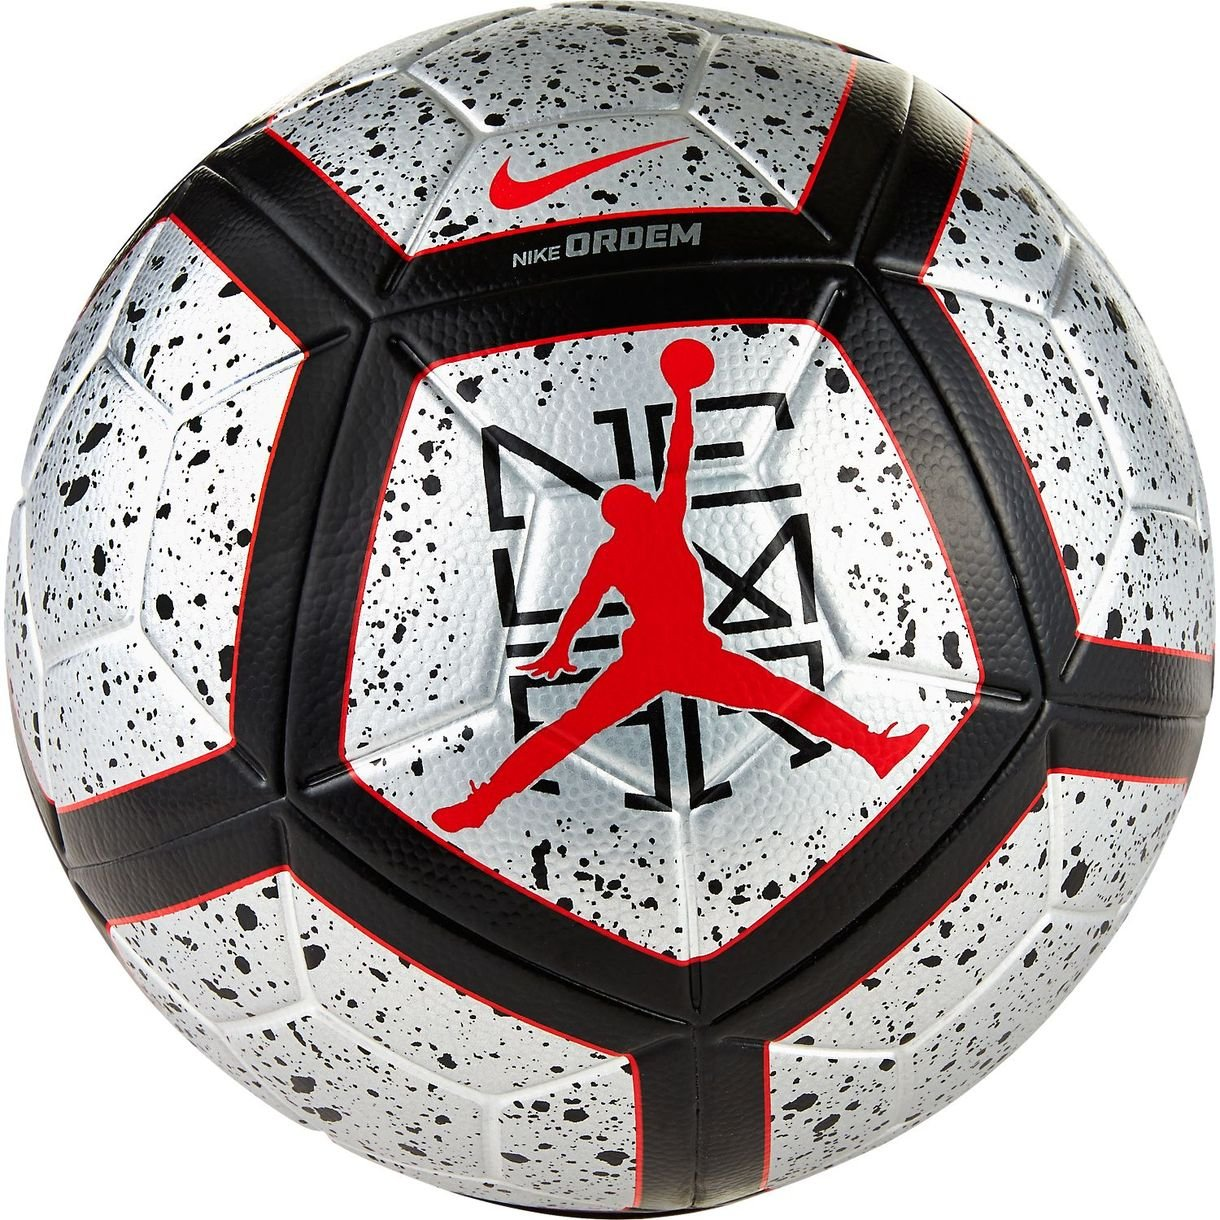 Nike Ordem ciento Neymar X Michael Jordan Official Match Ball ...